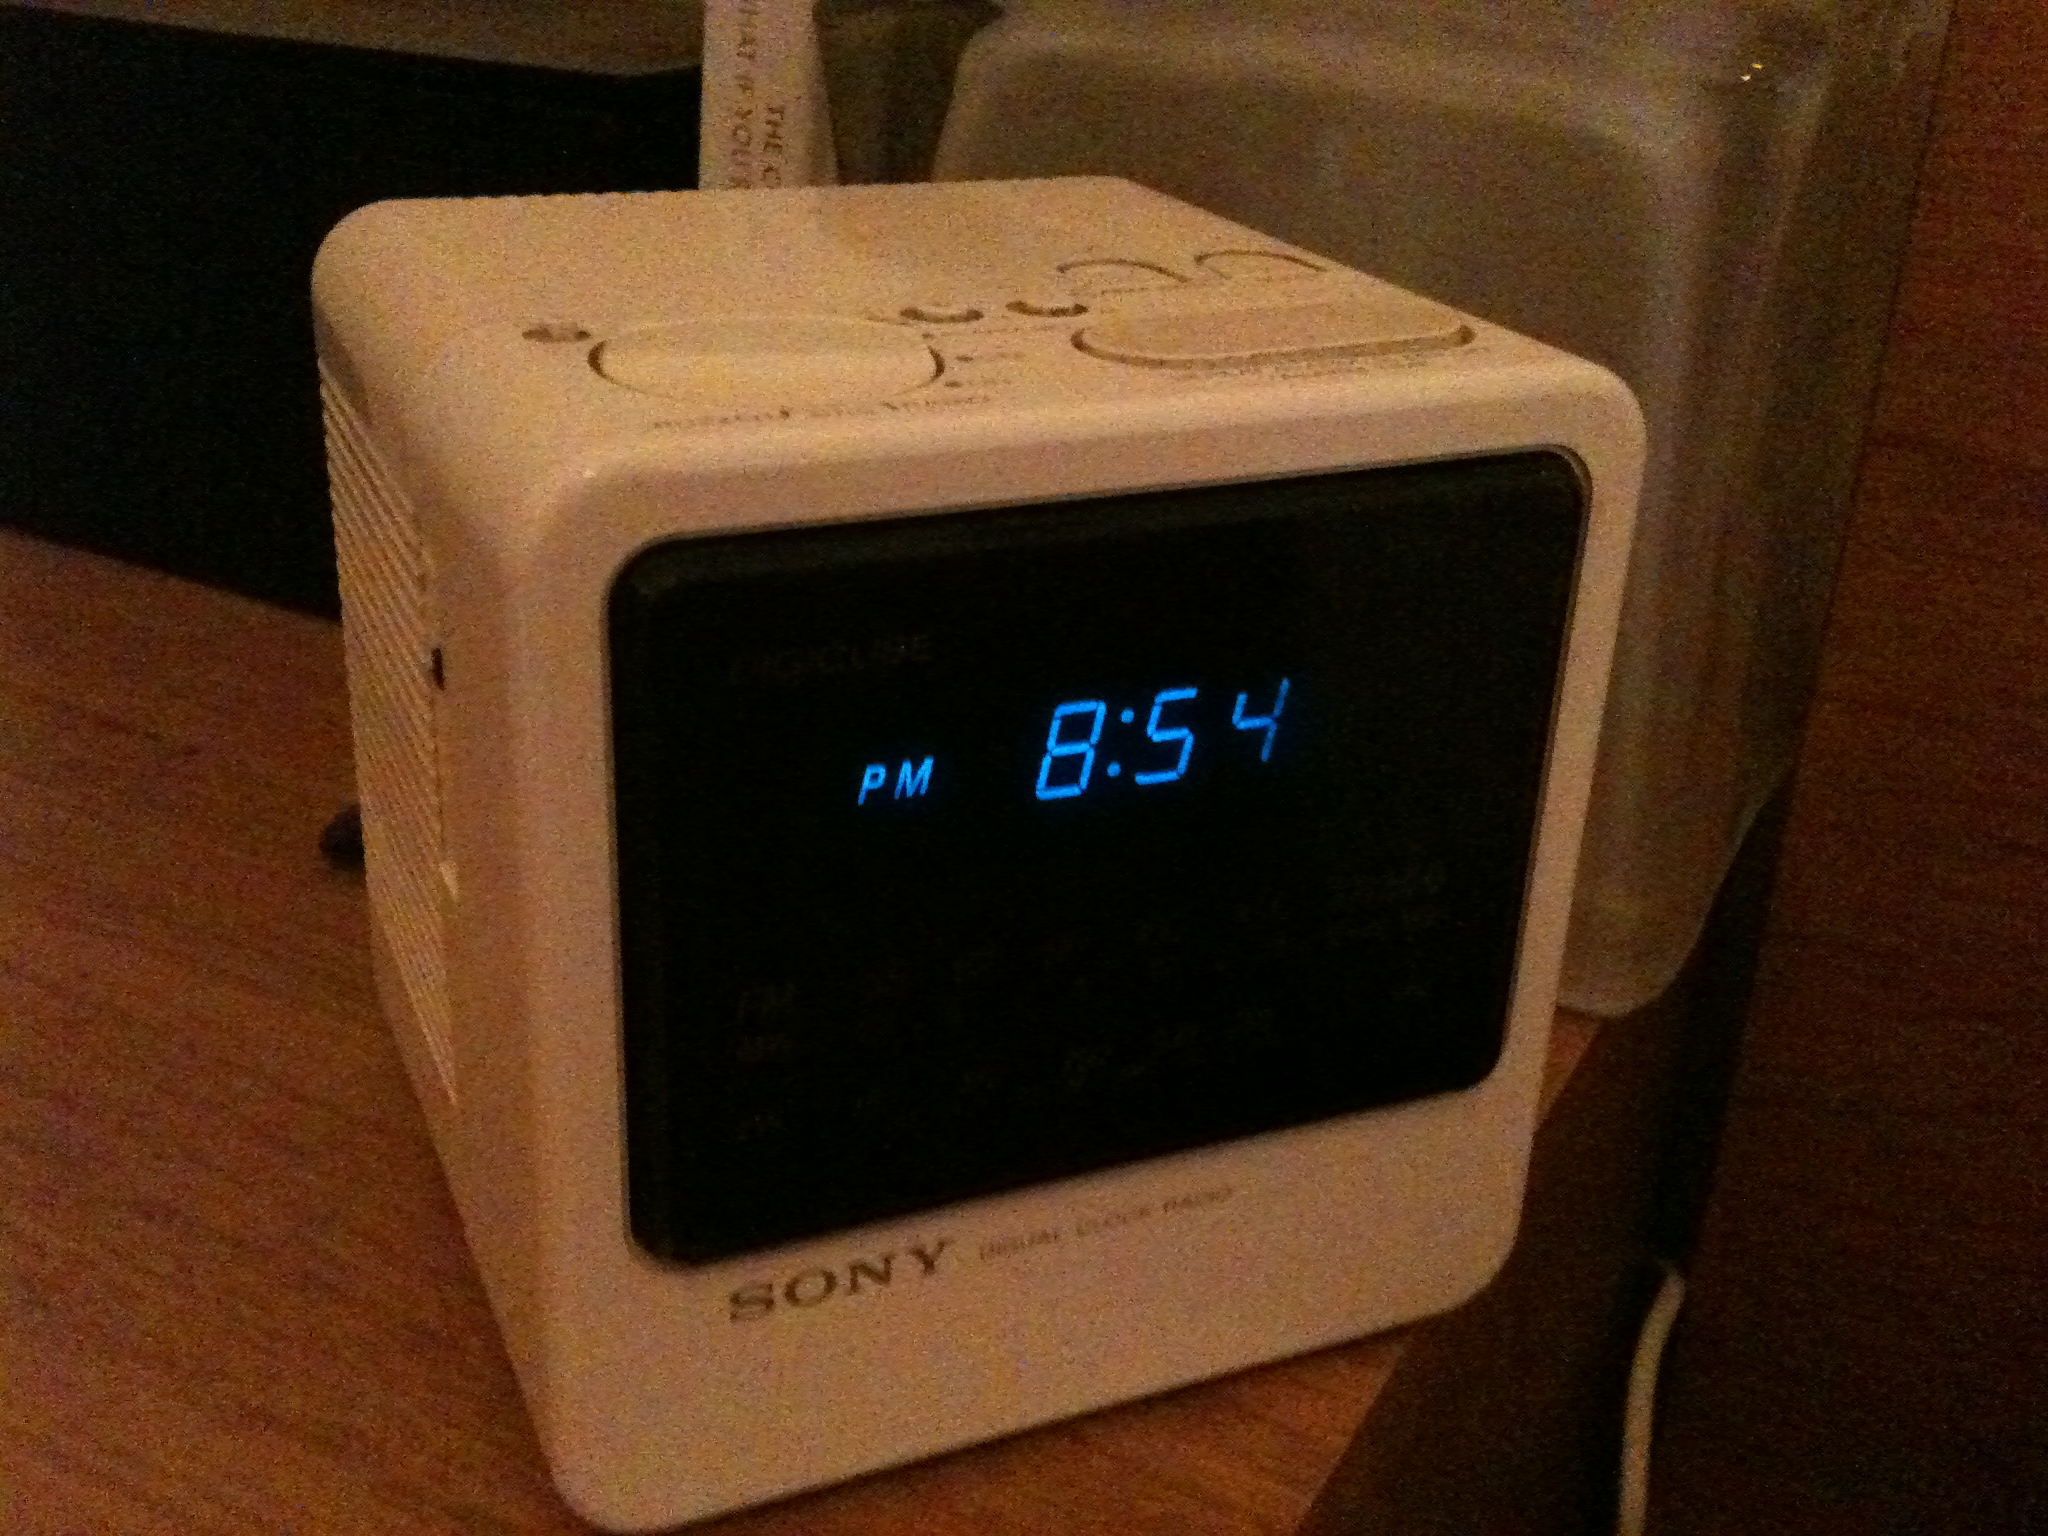 Pleasing Here Cockadoodle New Alarm Clock Lorn Pearson Digital Wall Clock Digital Alarm Clock furniture Pretty Digital Clock